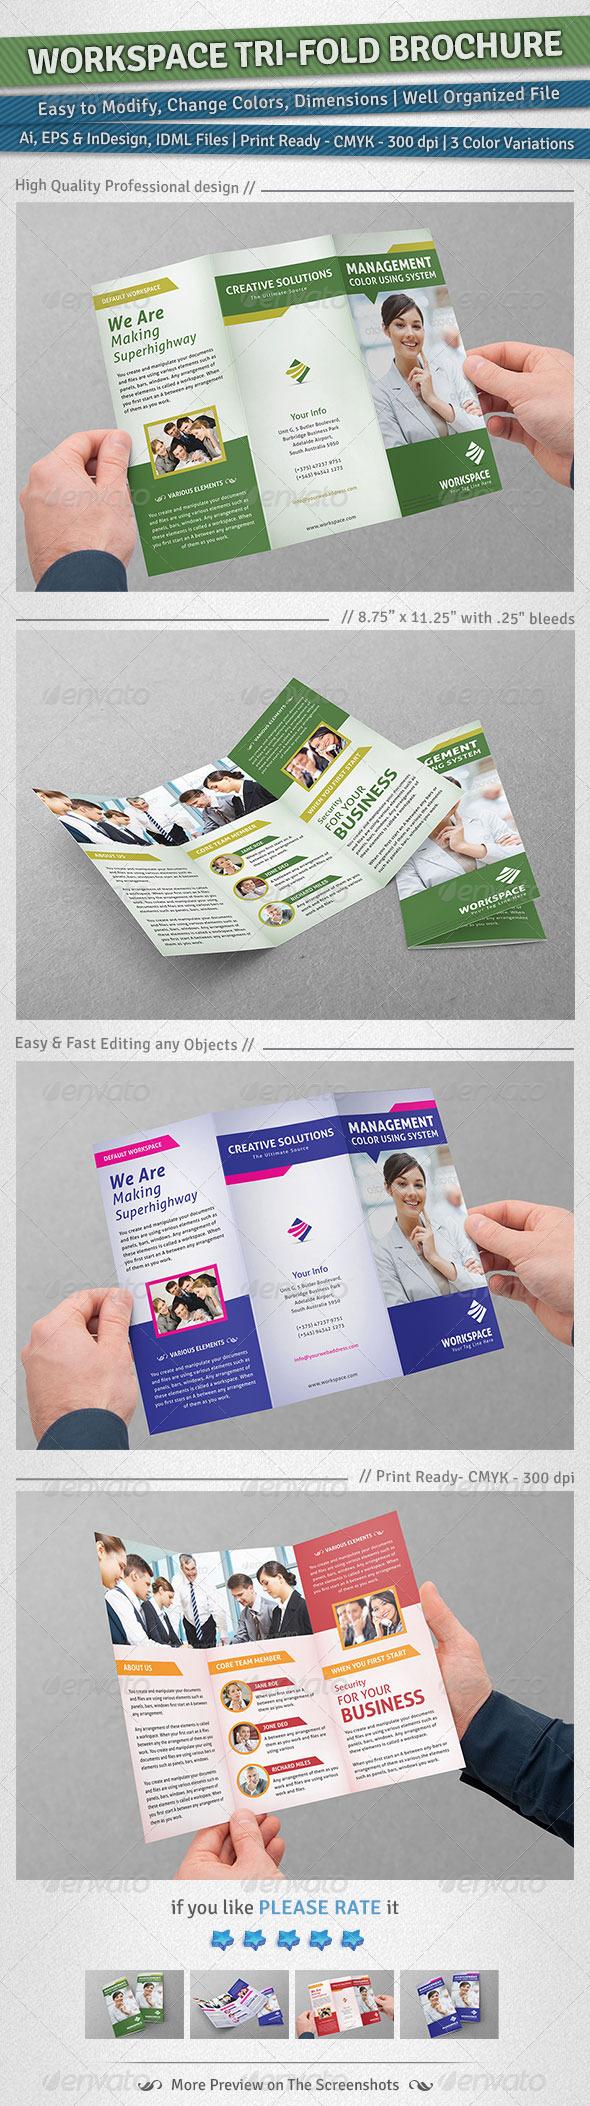 Workspace Tri-Fold Brochure - Corporate Brochures